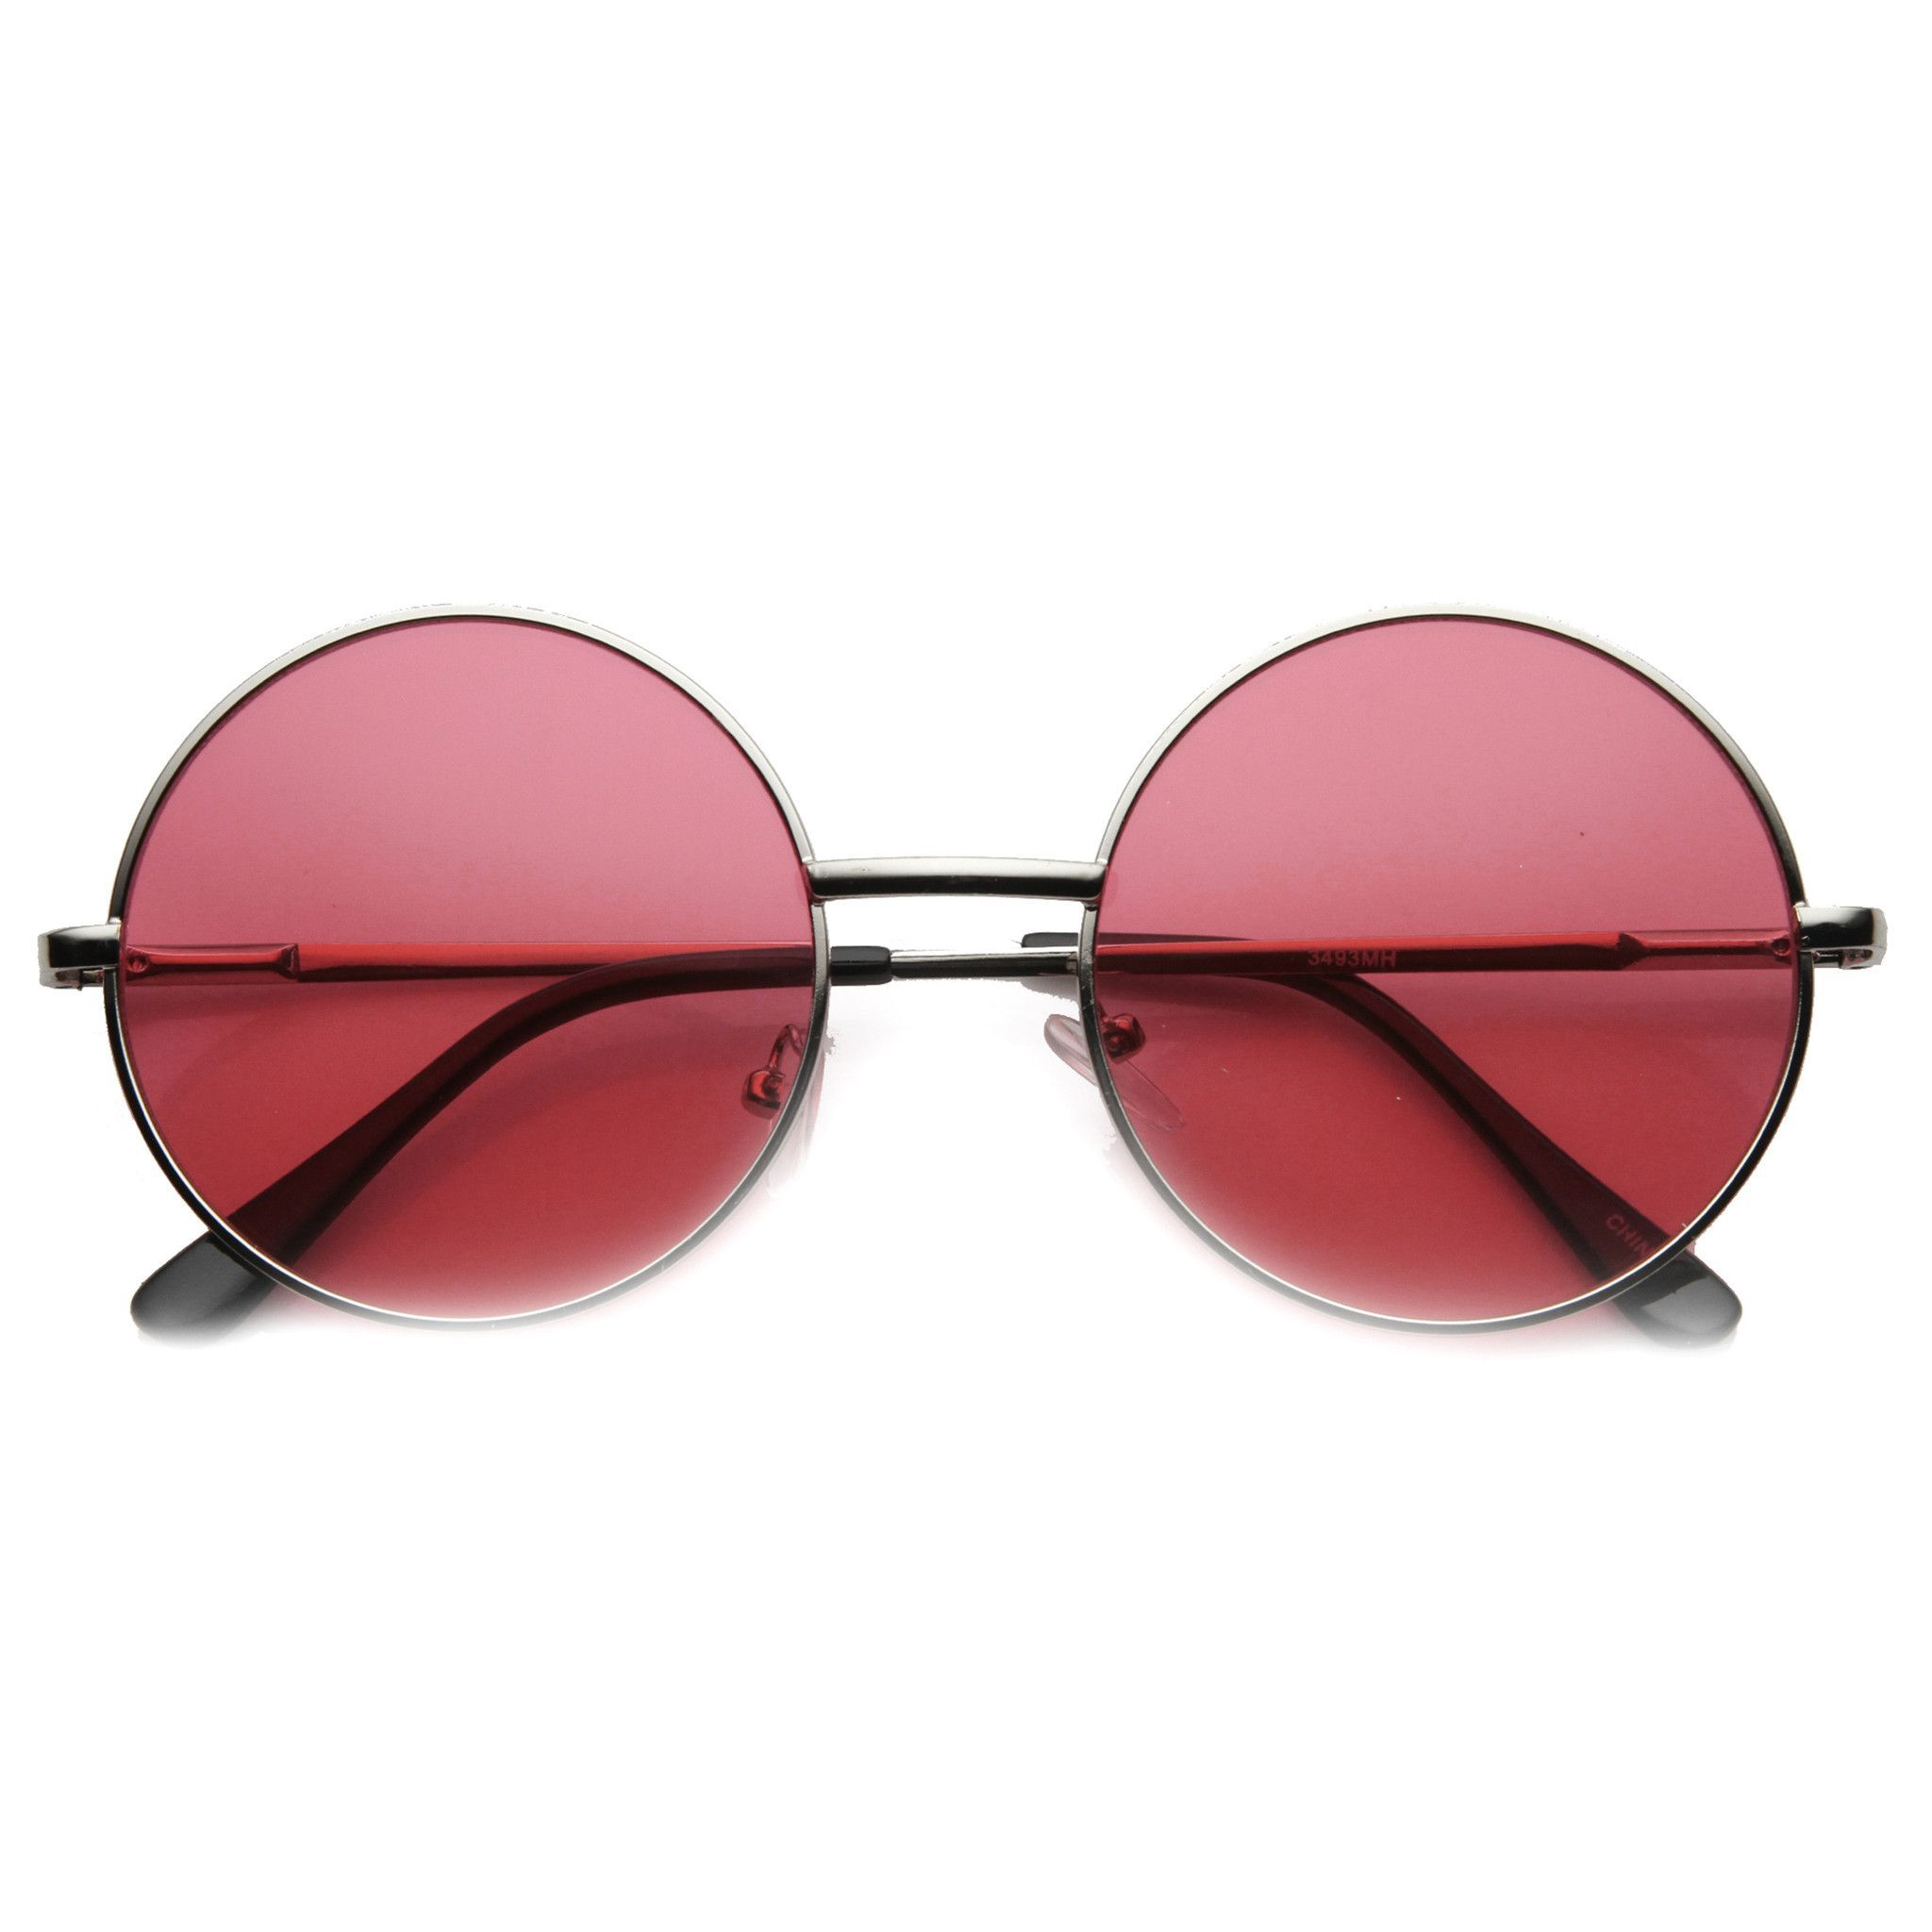 fdf857269c Round colors hippie sunglasses in 2019 | gift ideas | Retro sunglasses,  Round sunglasses, Circle sunglasses